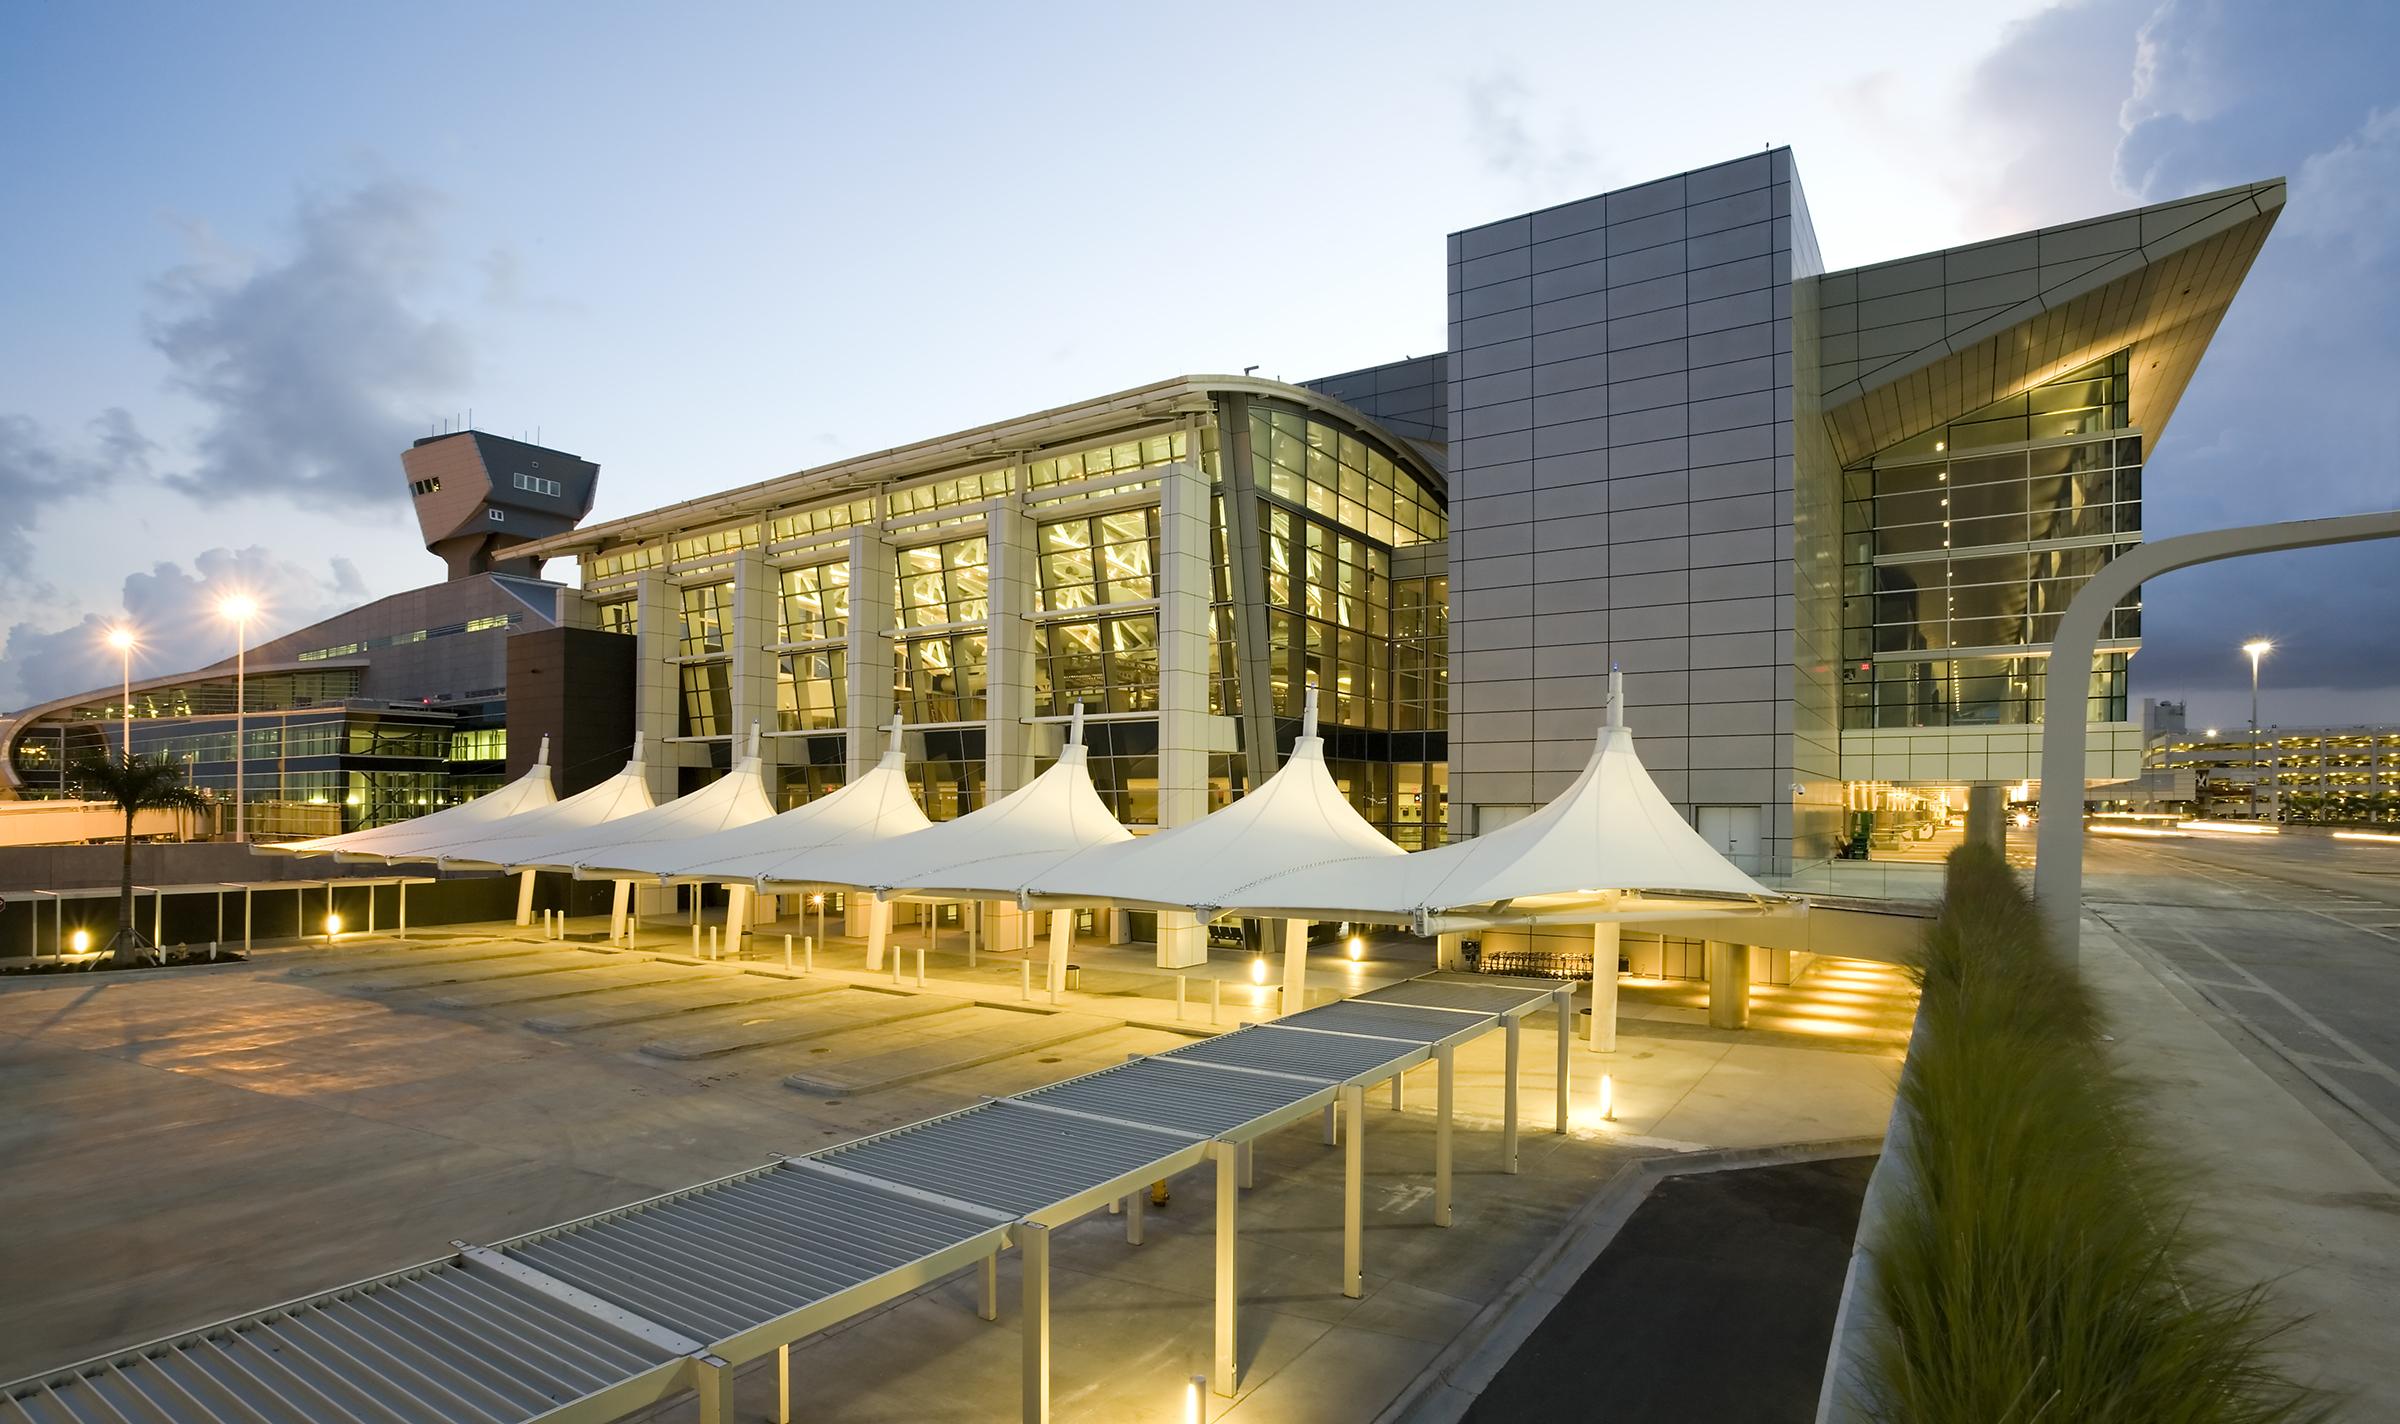 Memphis Airport Rental Car Center